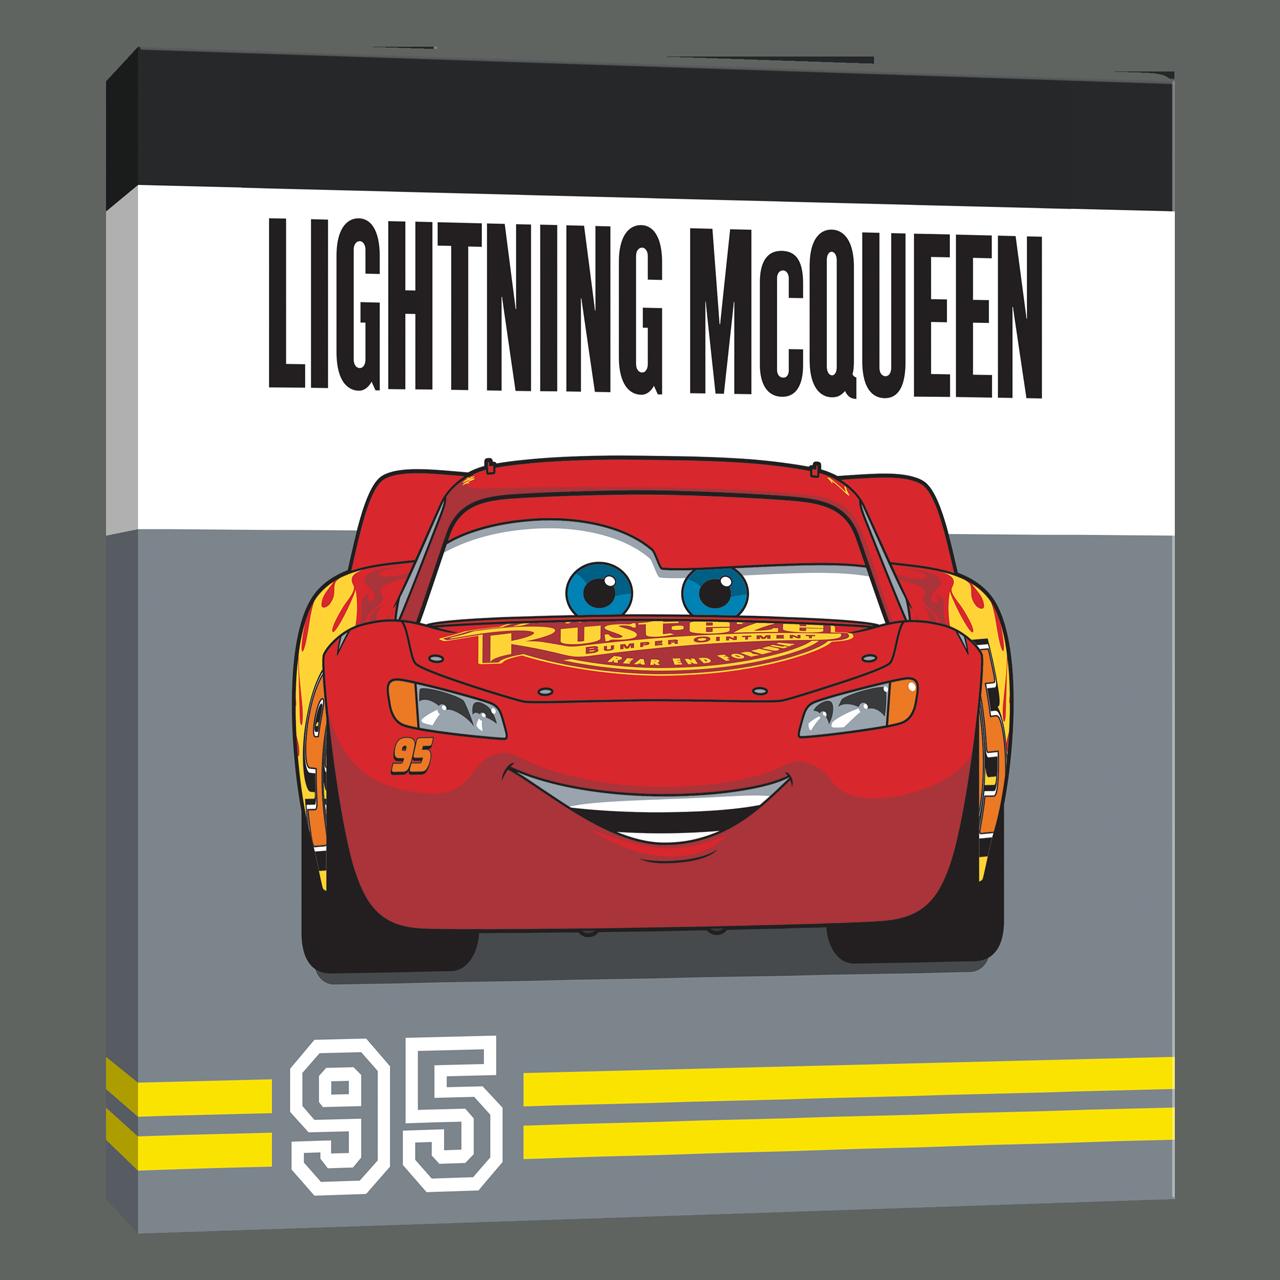 clipart freeuse download Lightning entertainart . Mcqueen clipart tinkerbell movie.